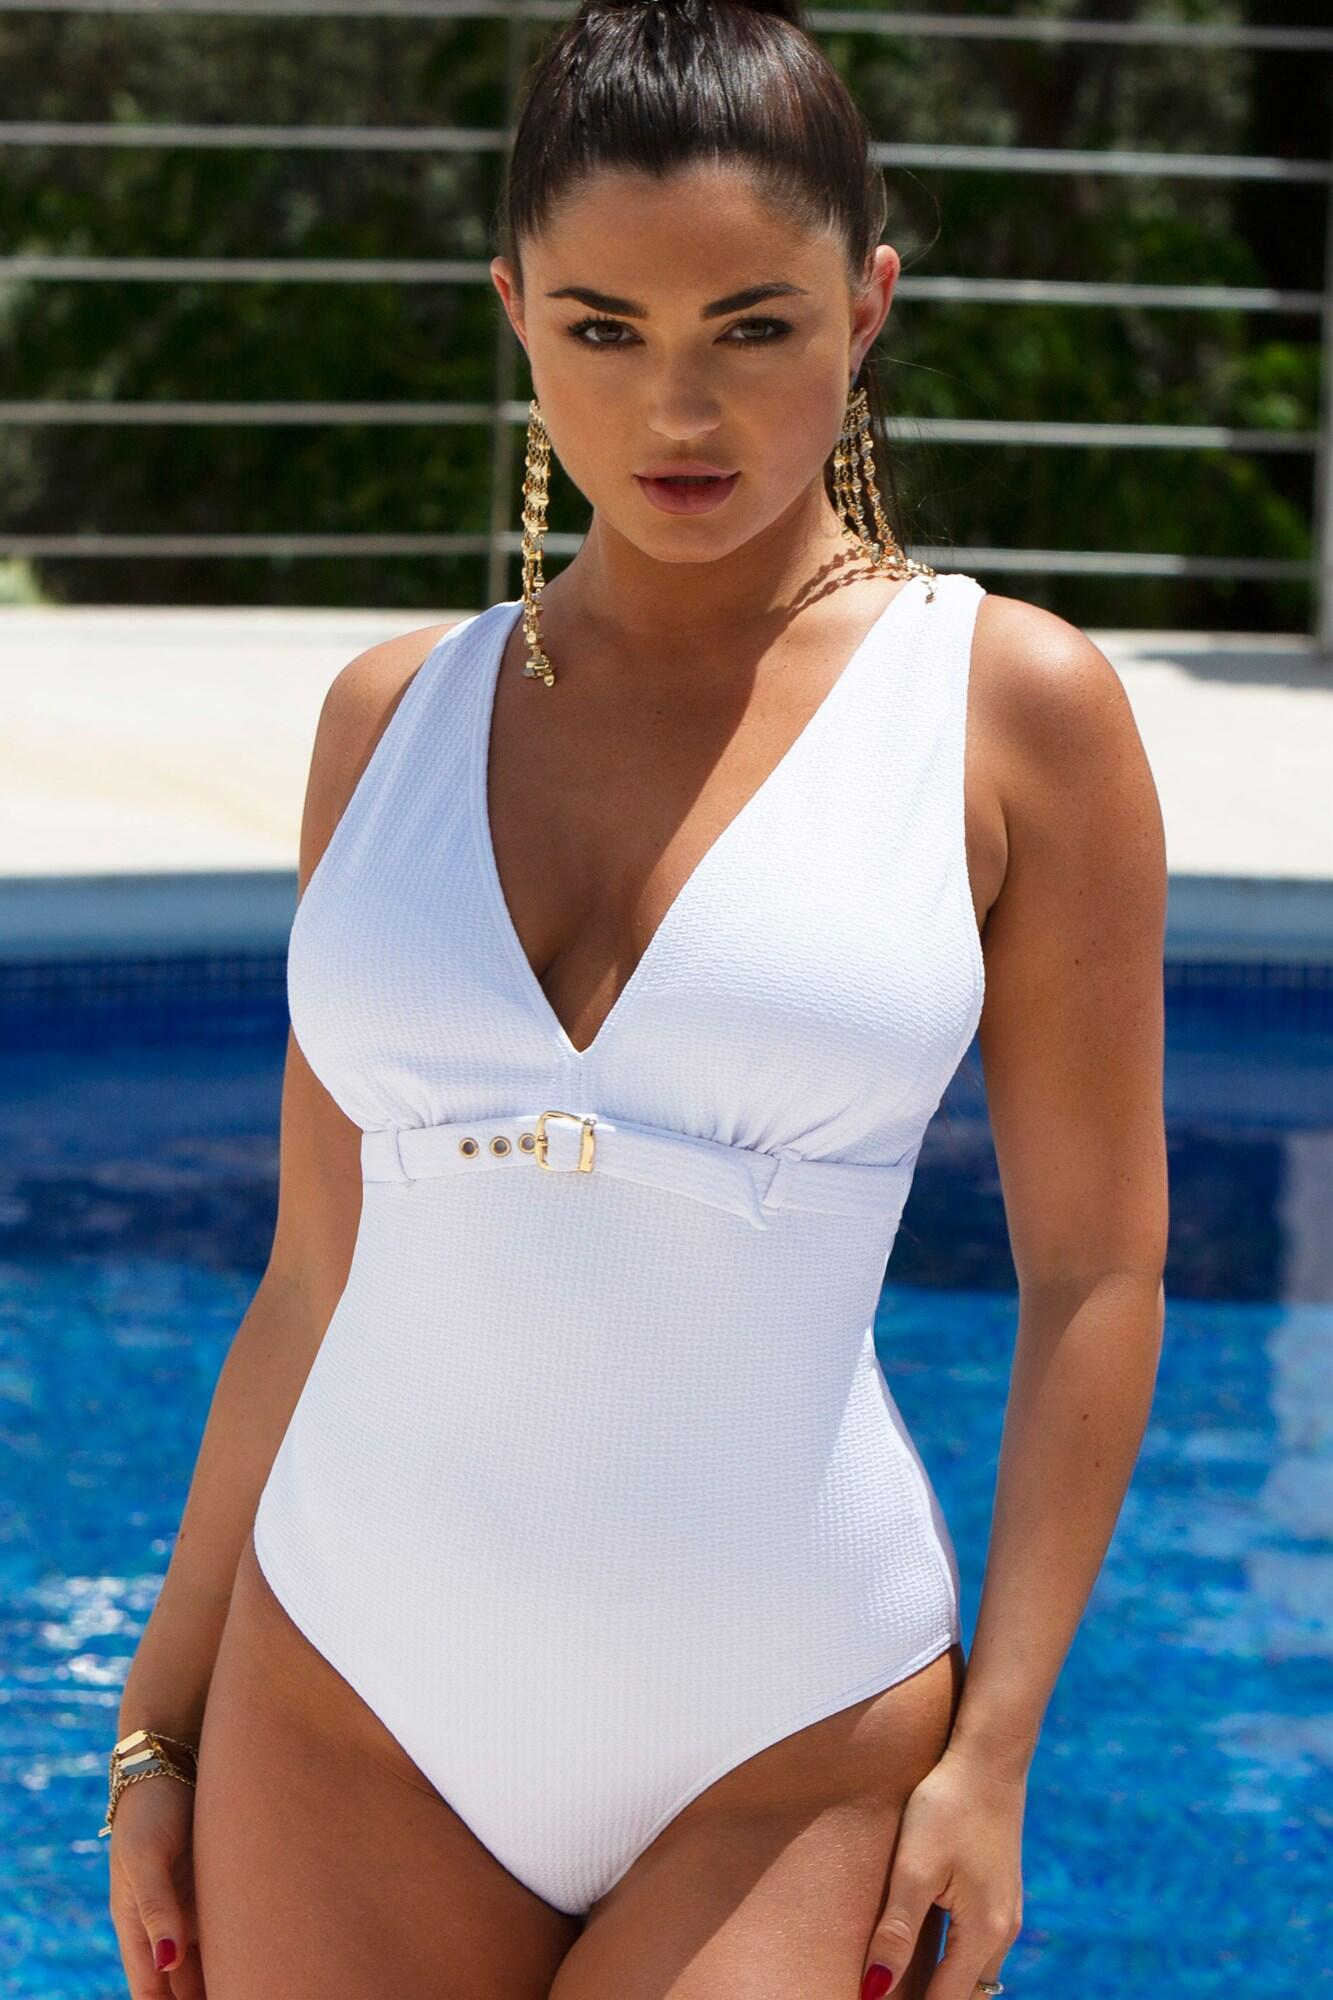 Sol Beach Swimsuit - White